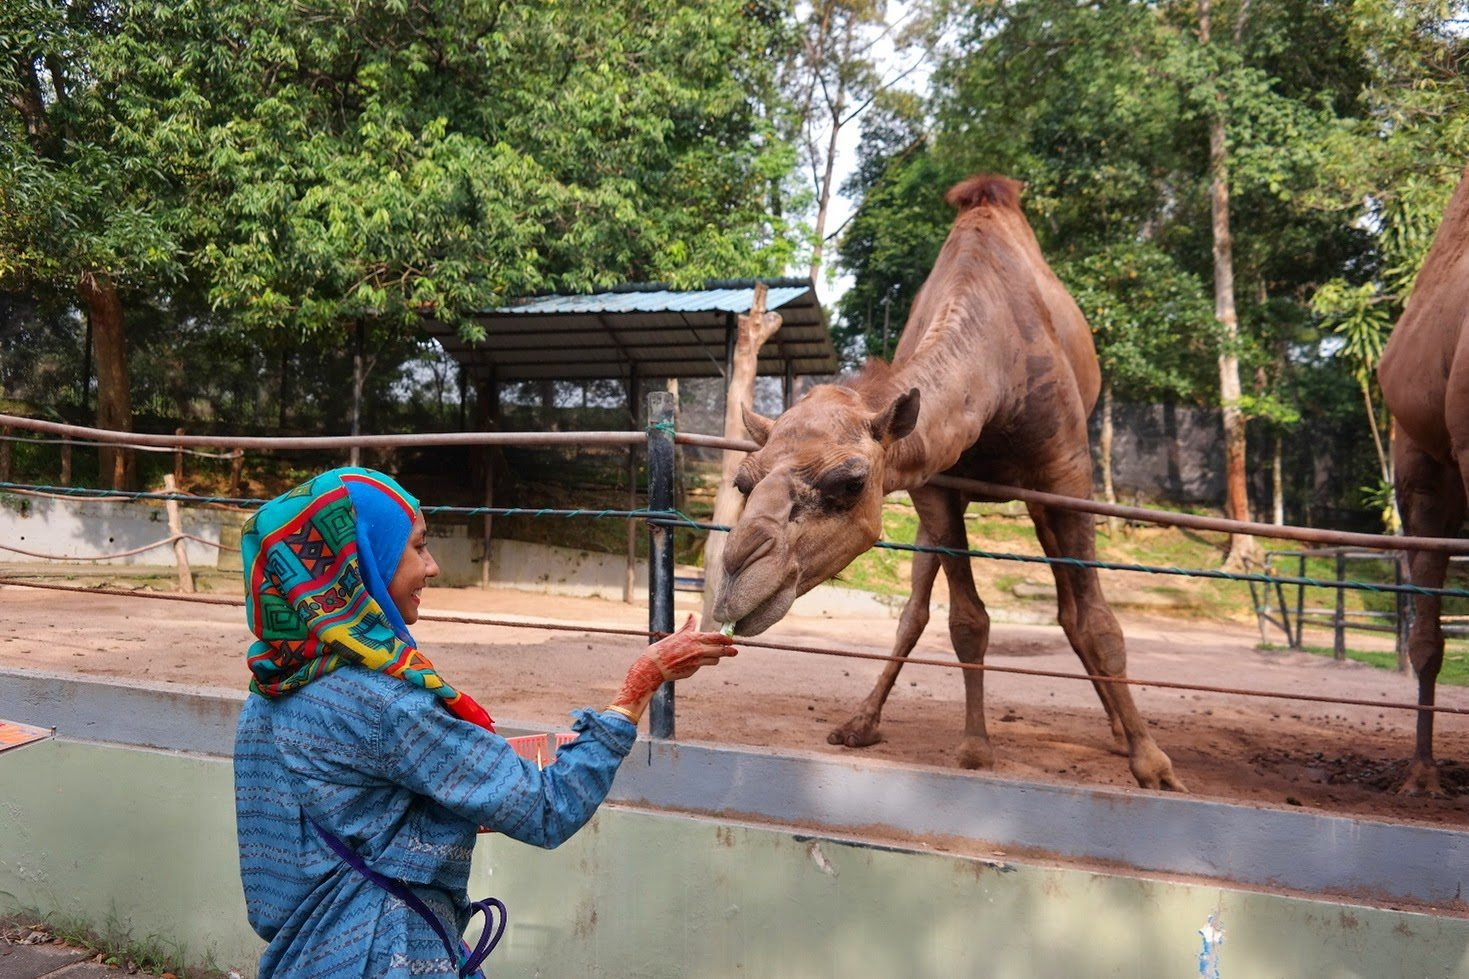 حديقة حيوان جوهور في ماليزيا